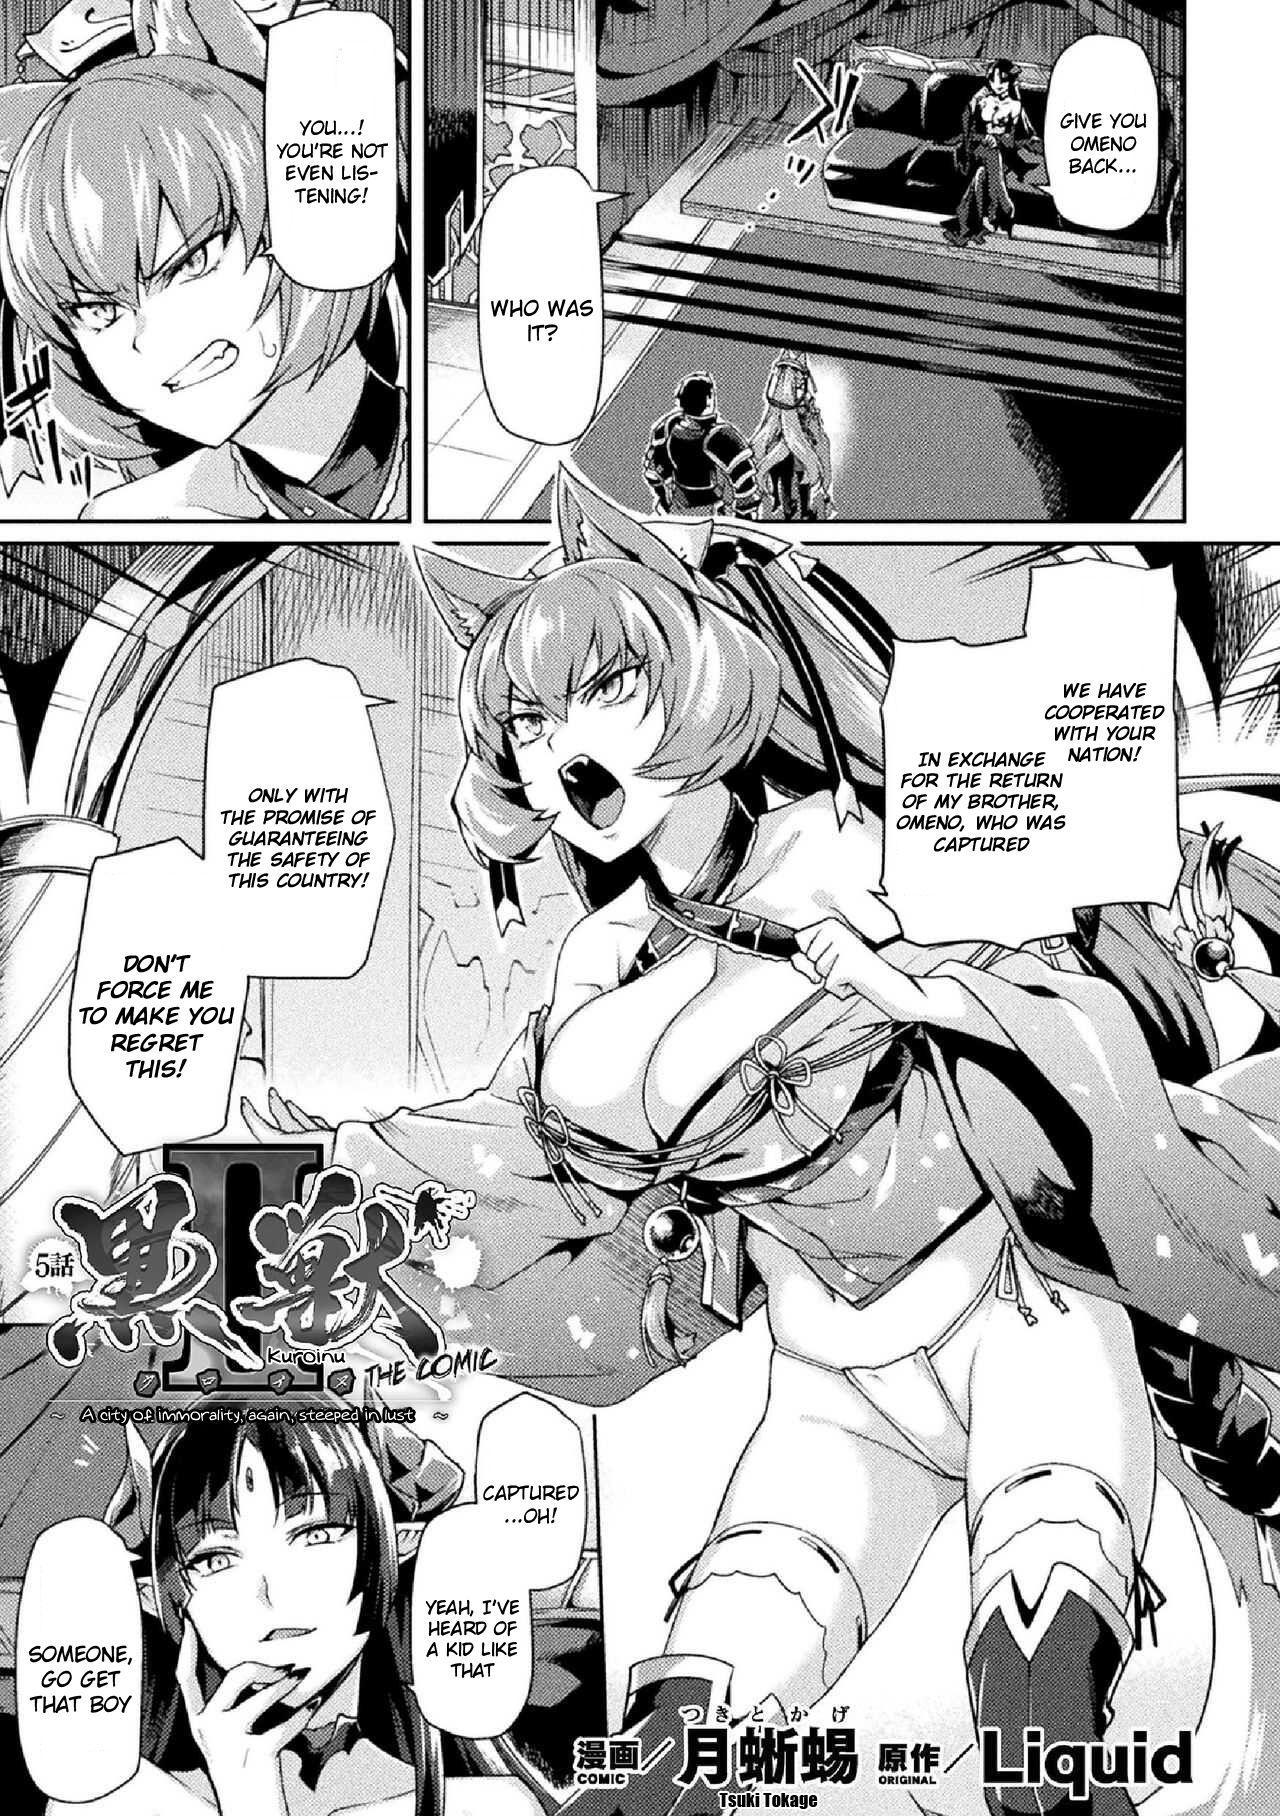 [Tsukitokage] Kuroinu II ~Inyoku ni Somaru Haitoku no Miyako, Futatabi~ THE COMIC Ch. 5 (Kukkoro Heroines Vol. 5) [English] [Klub Kemoner] [Decensored] [Digital] 0